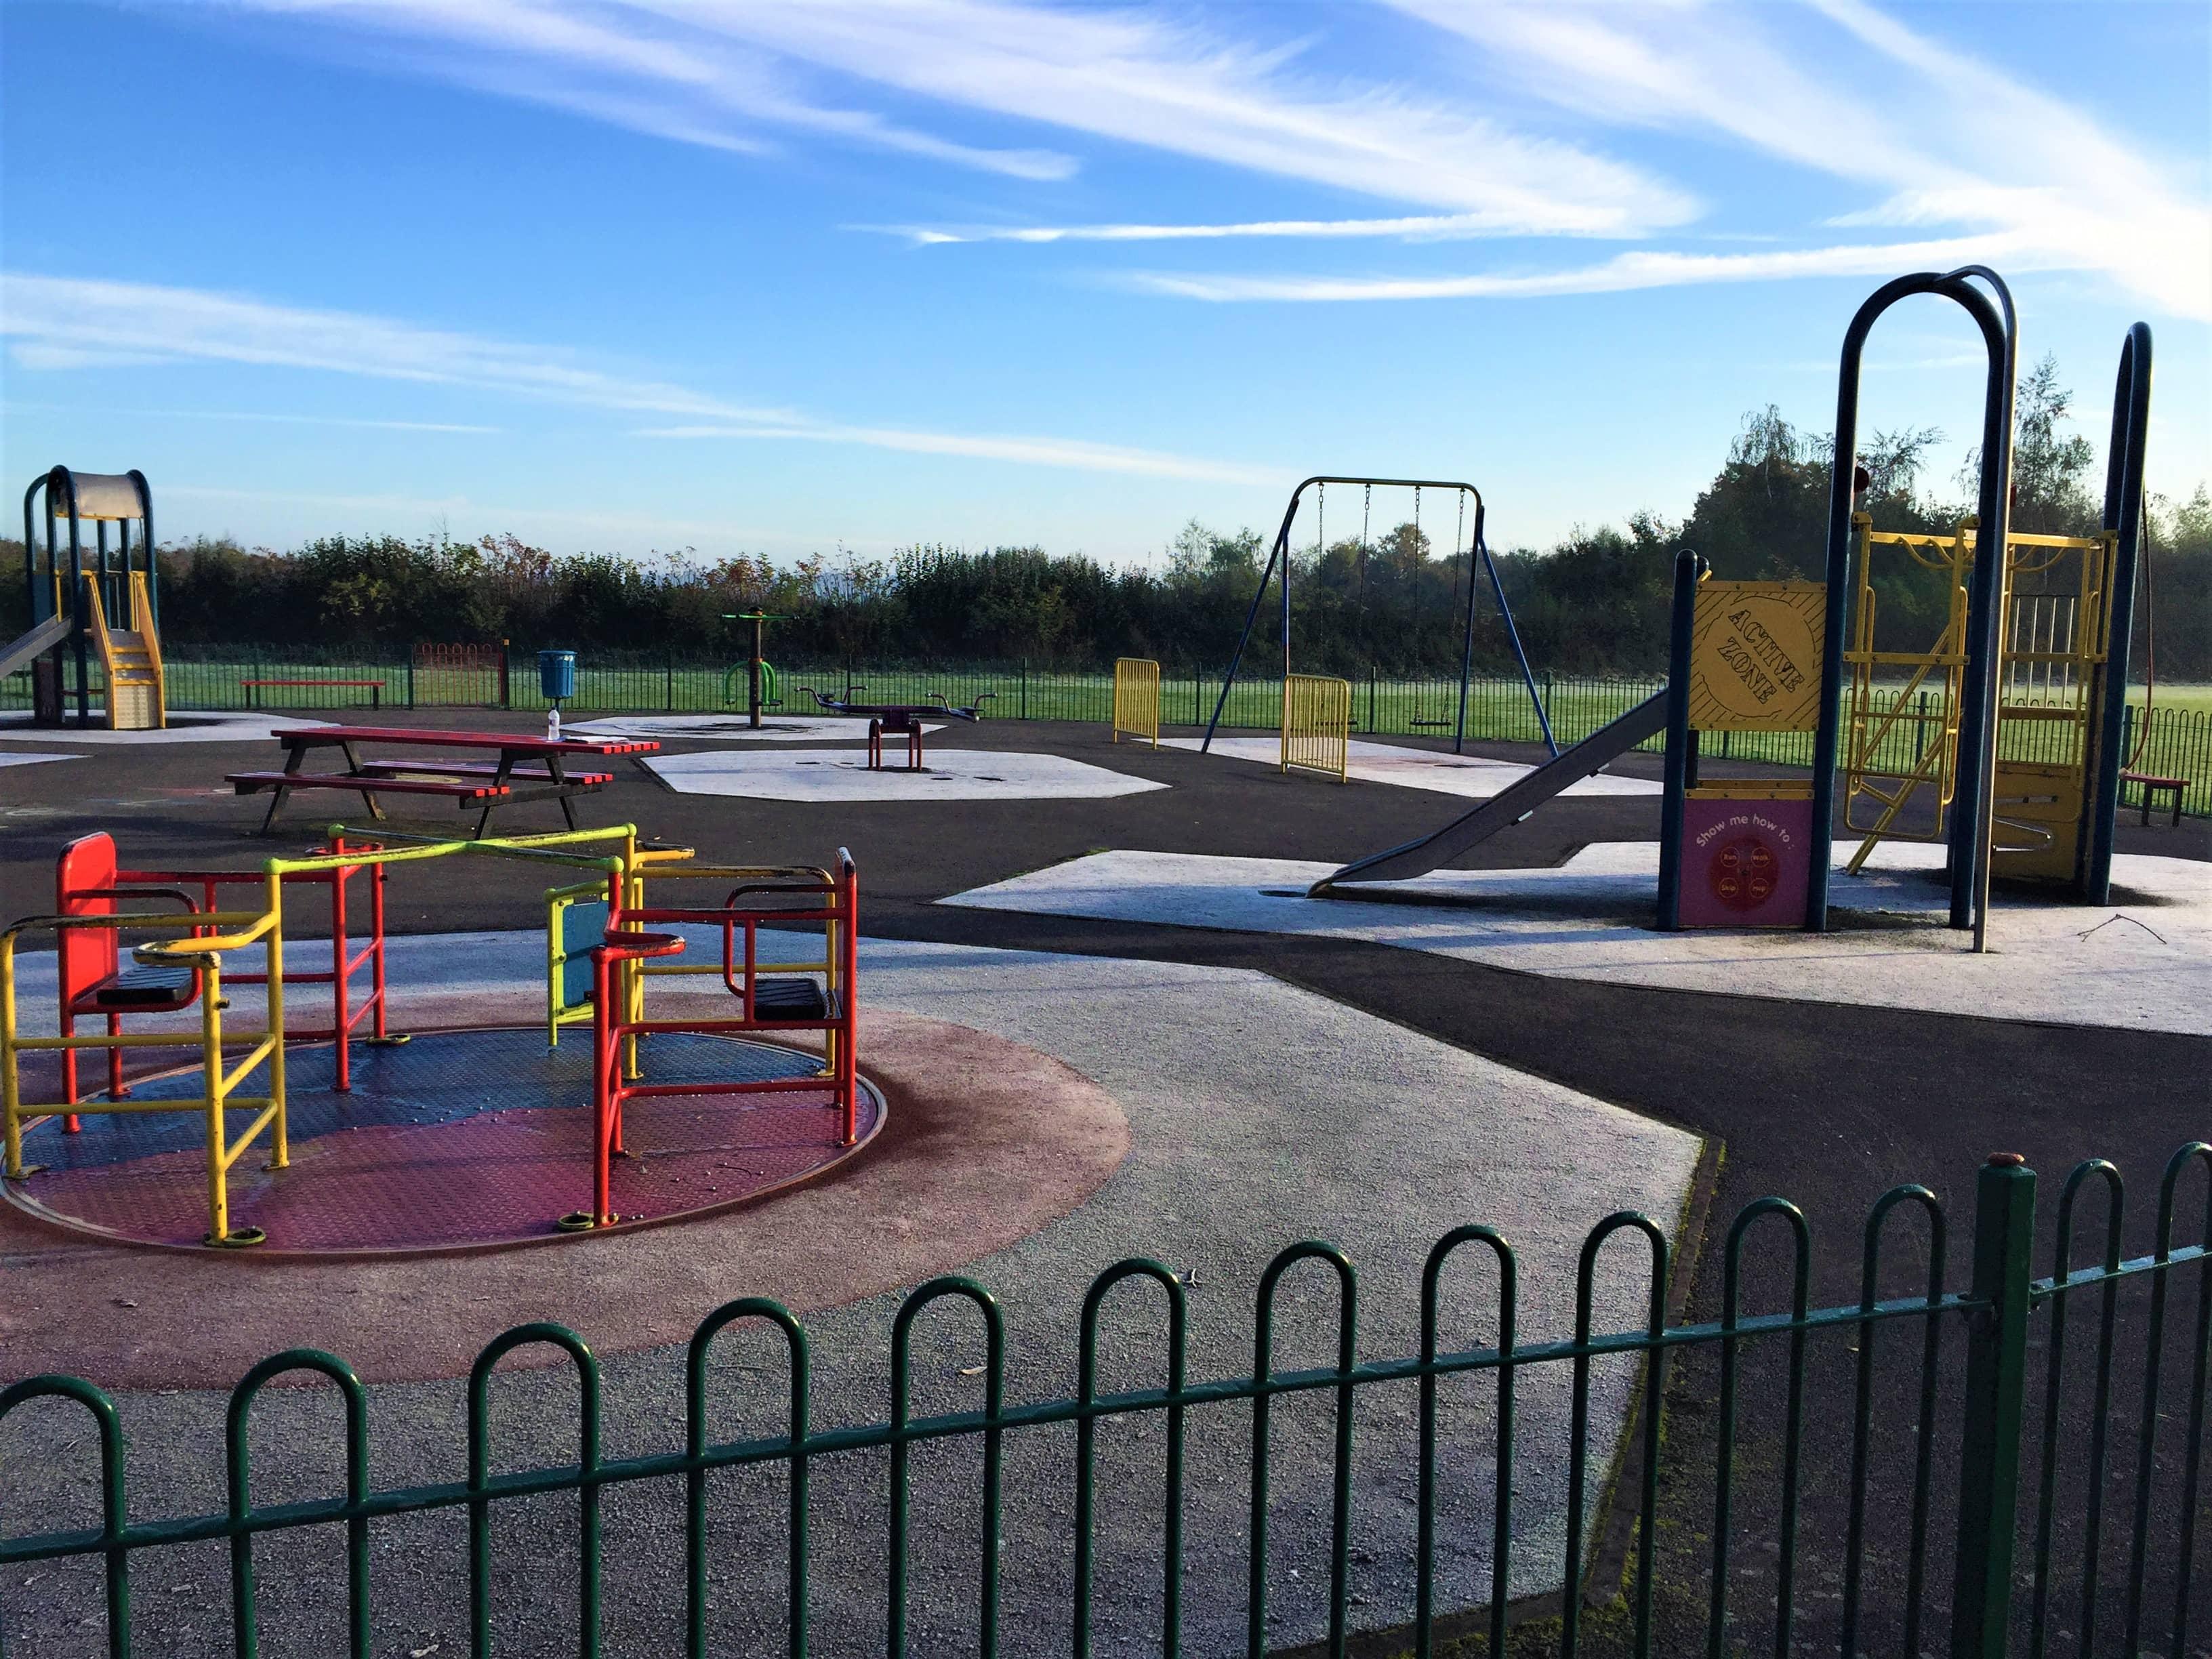 Lavendar Hall Park